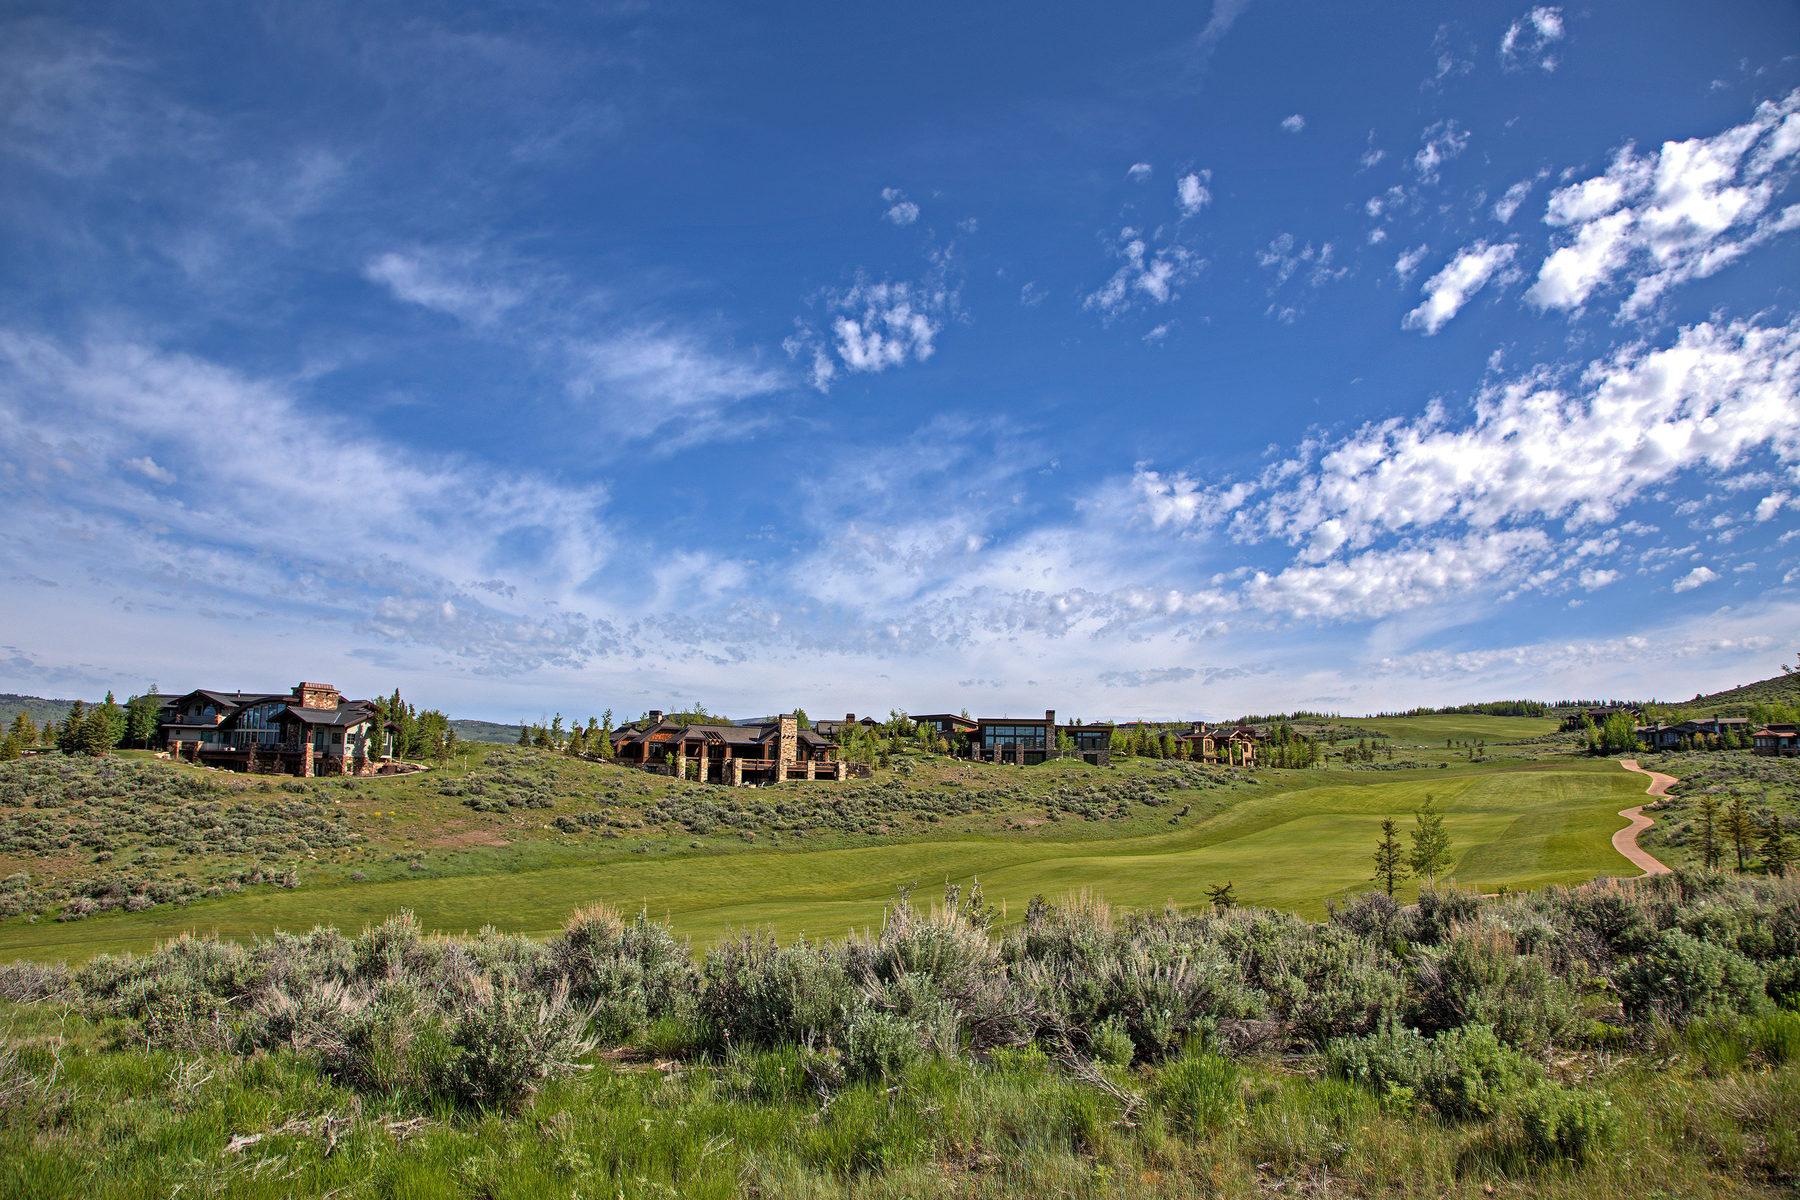 Terreno por un Venta en Fabulous Views From This Promontory Golf Course Lot 3217 Westview Trail Lot 24 Park City, Utah, 84098 Estados Unidos